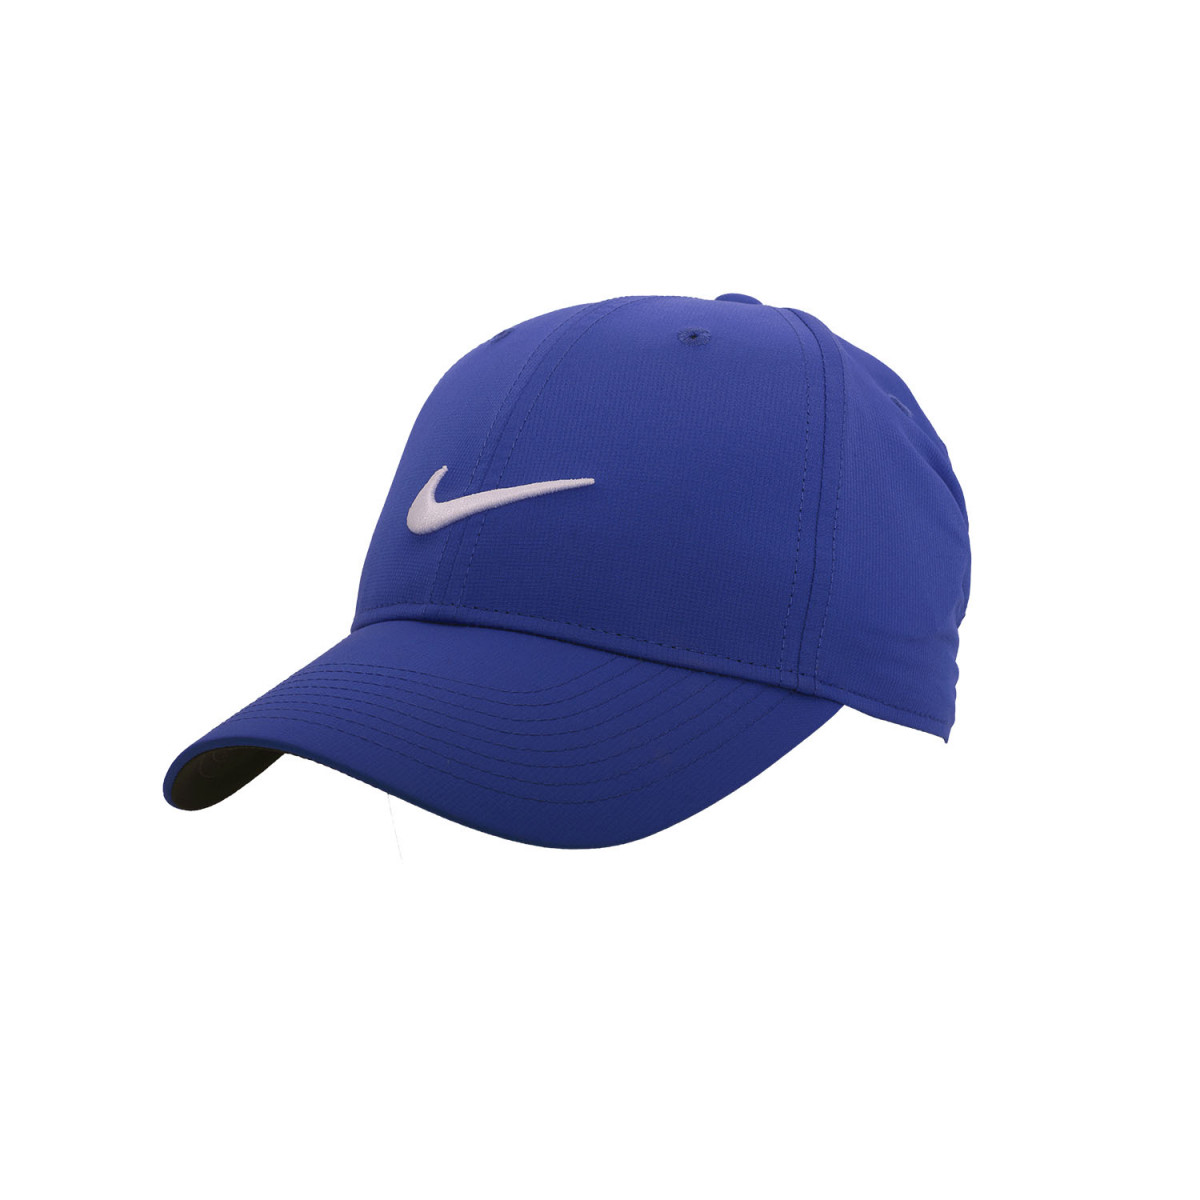 Gorra Nike Legacy 91 - Caps - Gorros - Accesorios - Mujer 1bfc42129c8